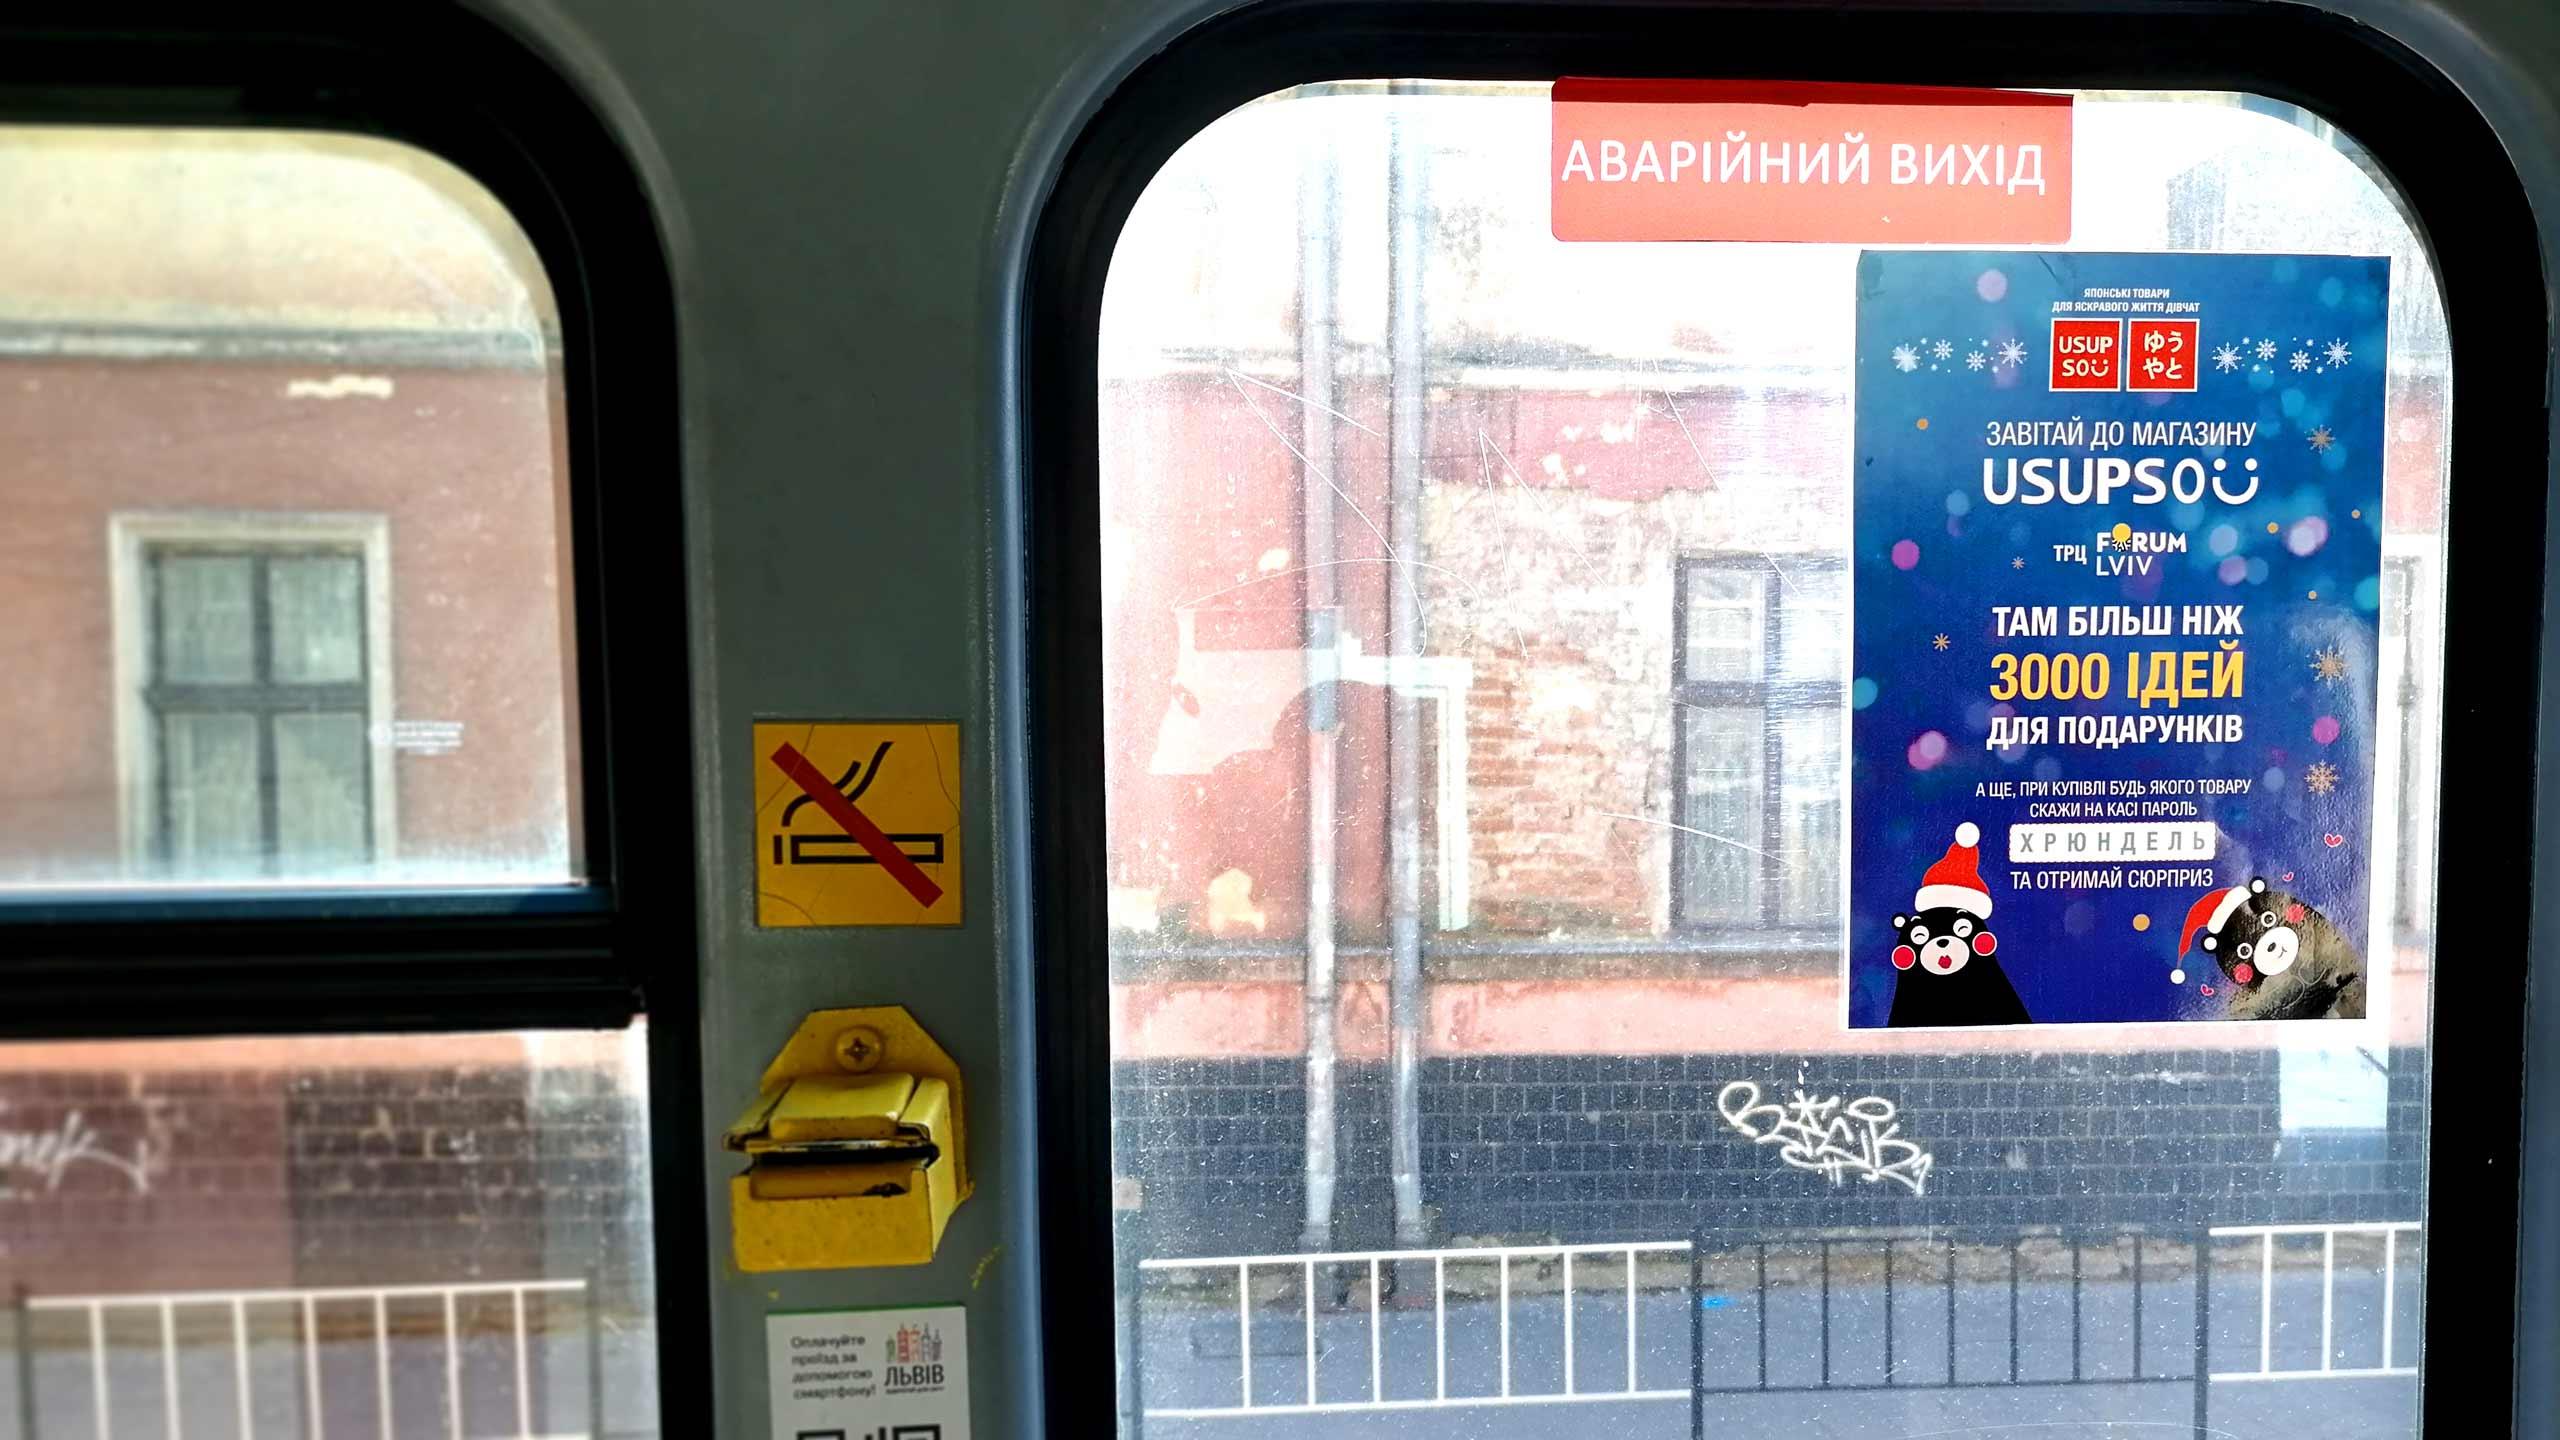 Реклама метро Харьков